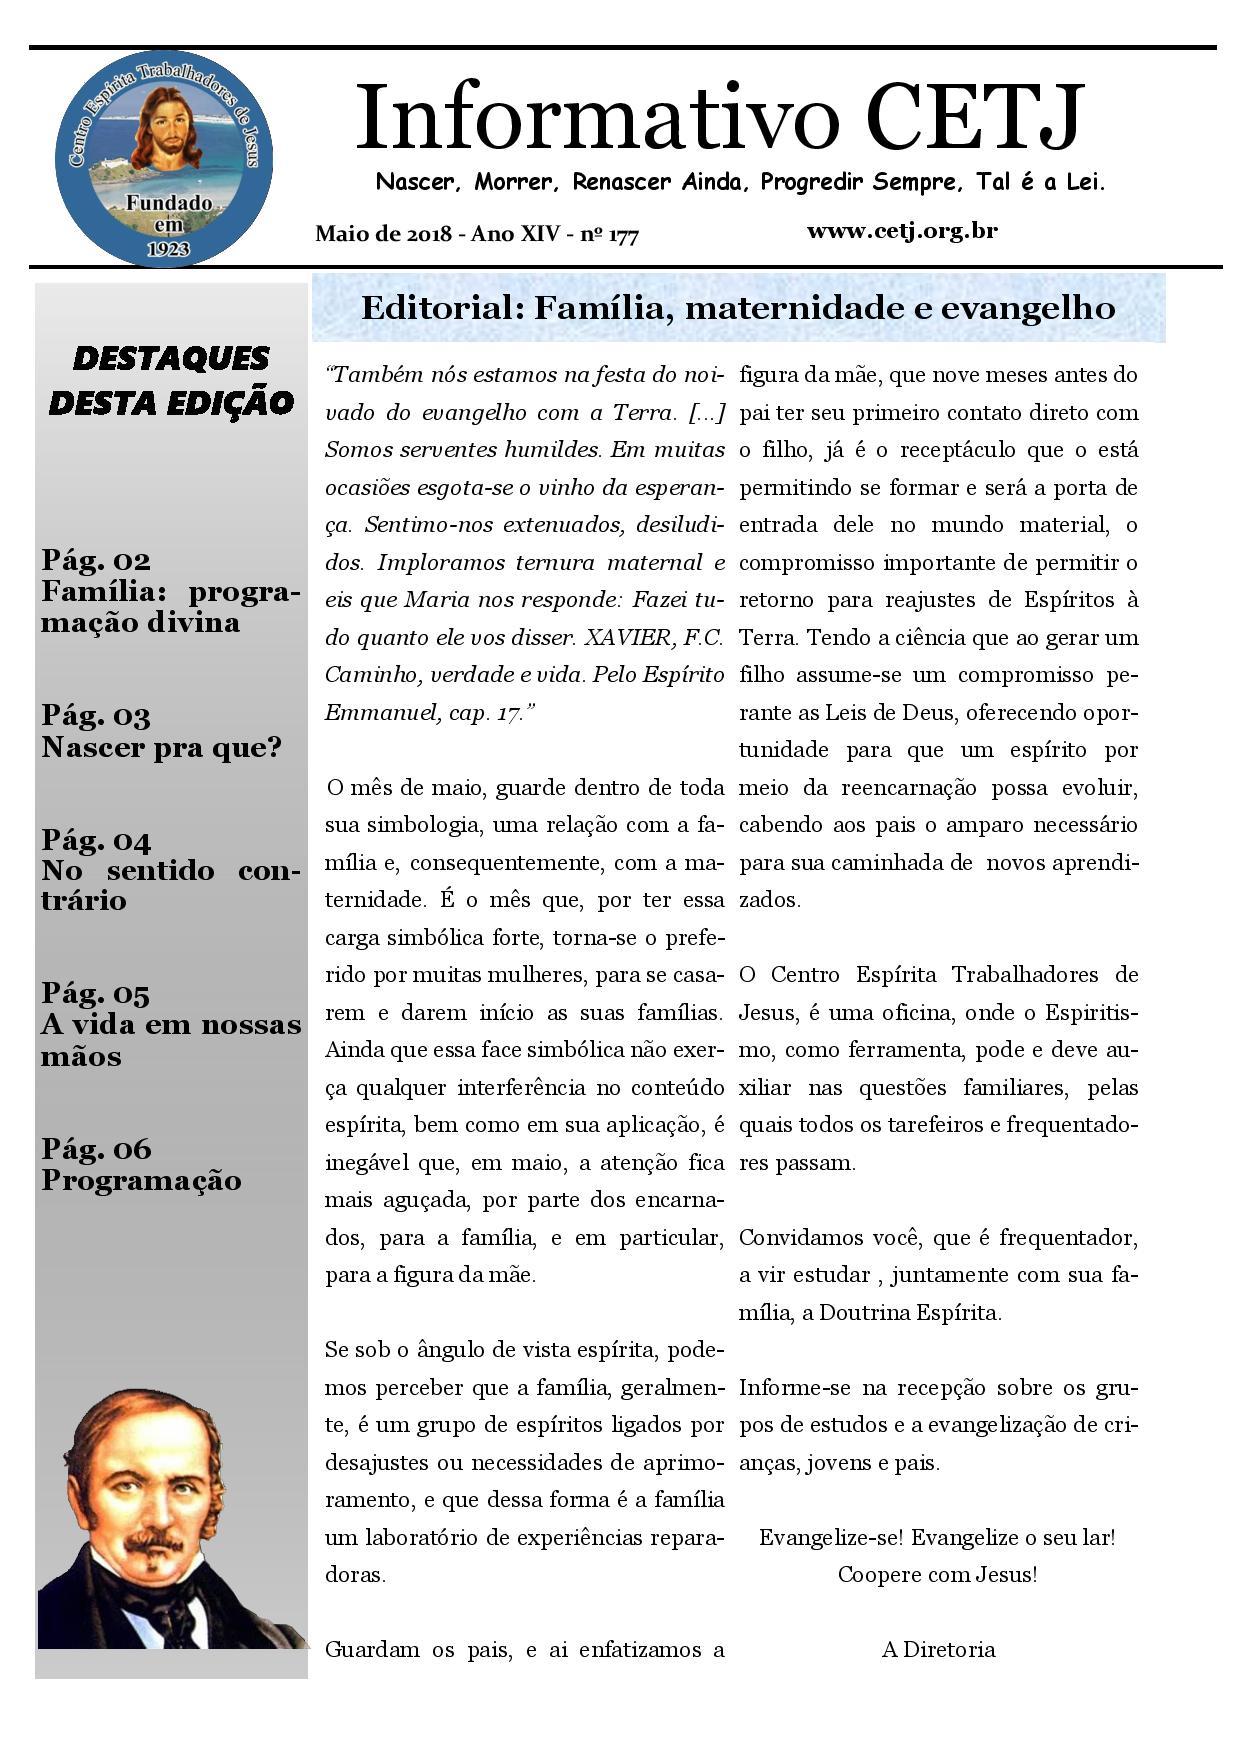 Informativo maio de 2018_net-page-001